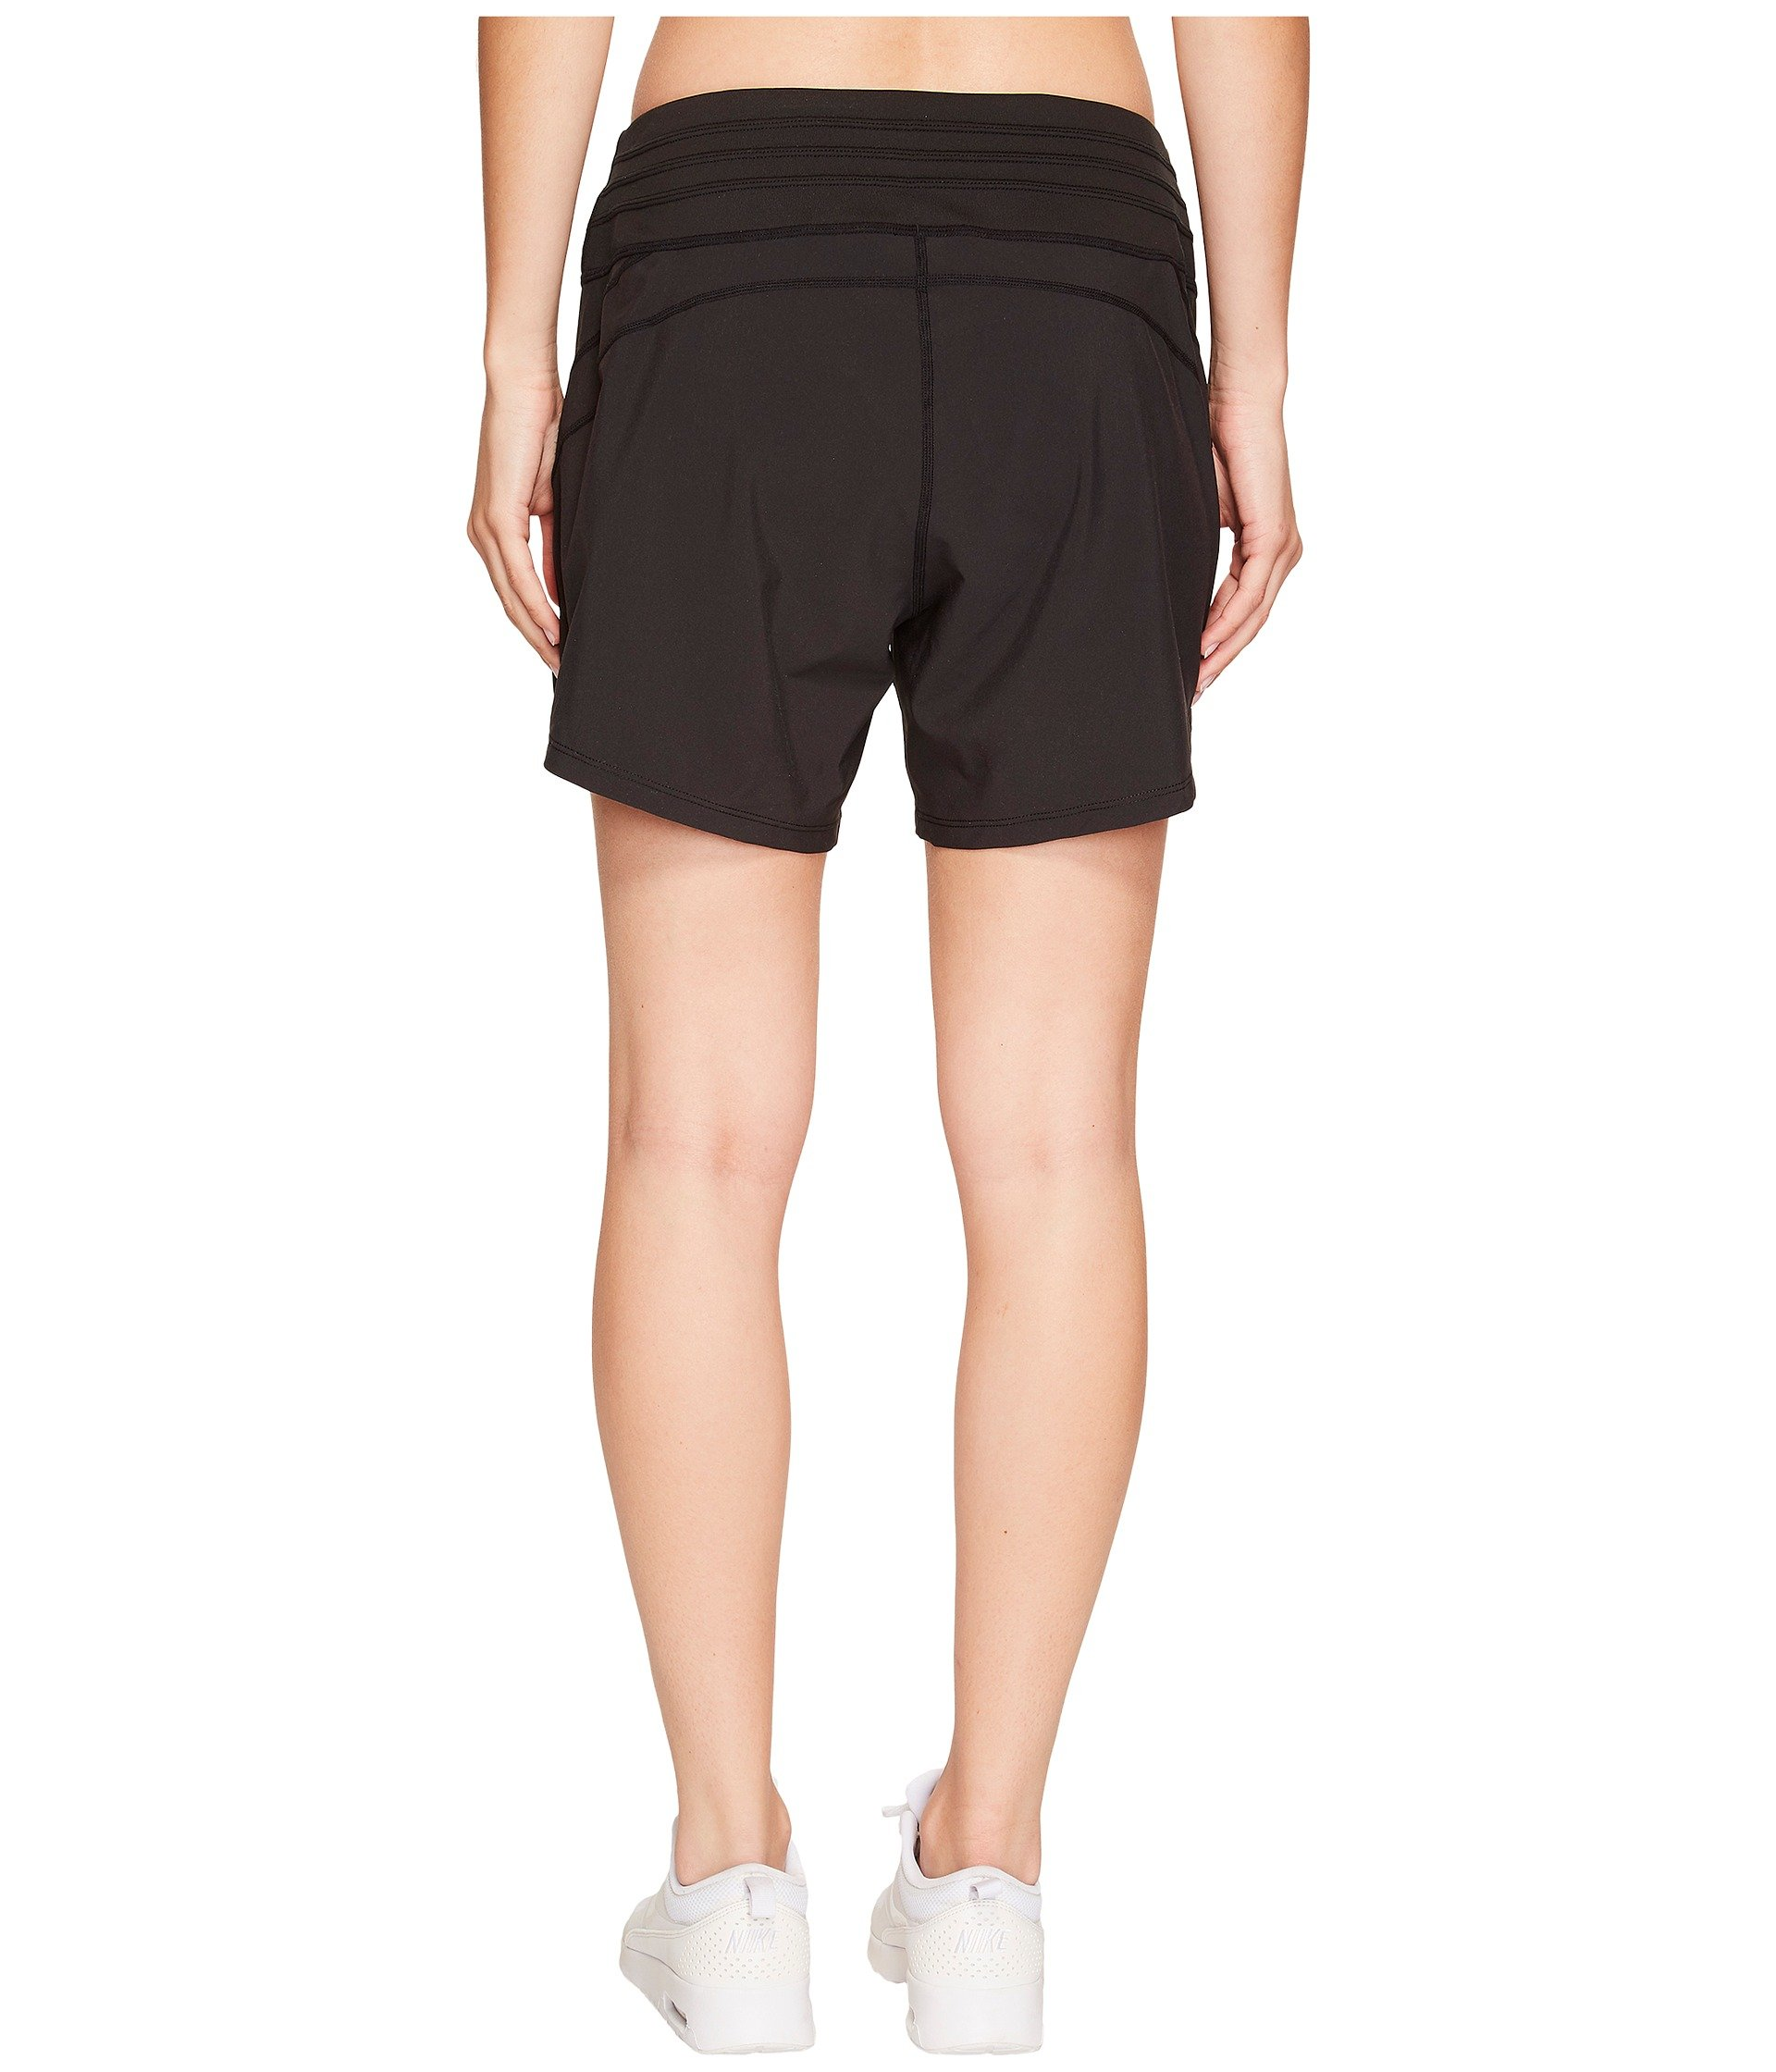 Short Black Skirt Go Sports Longer wCn0x0qXtS